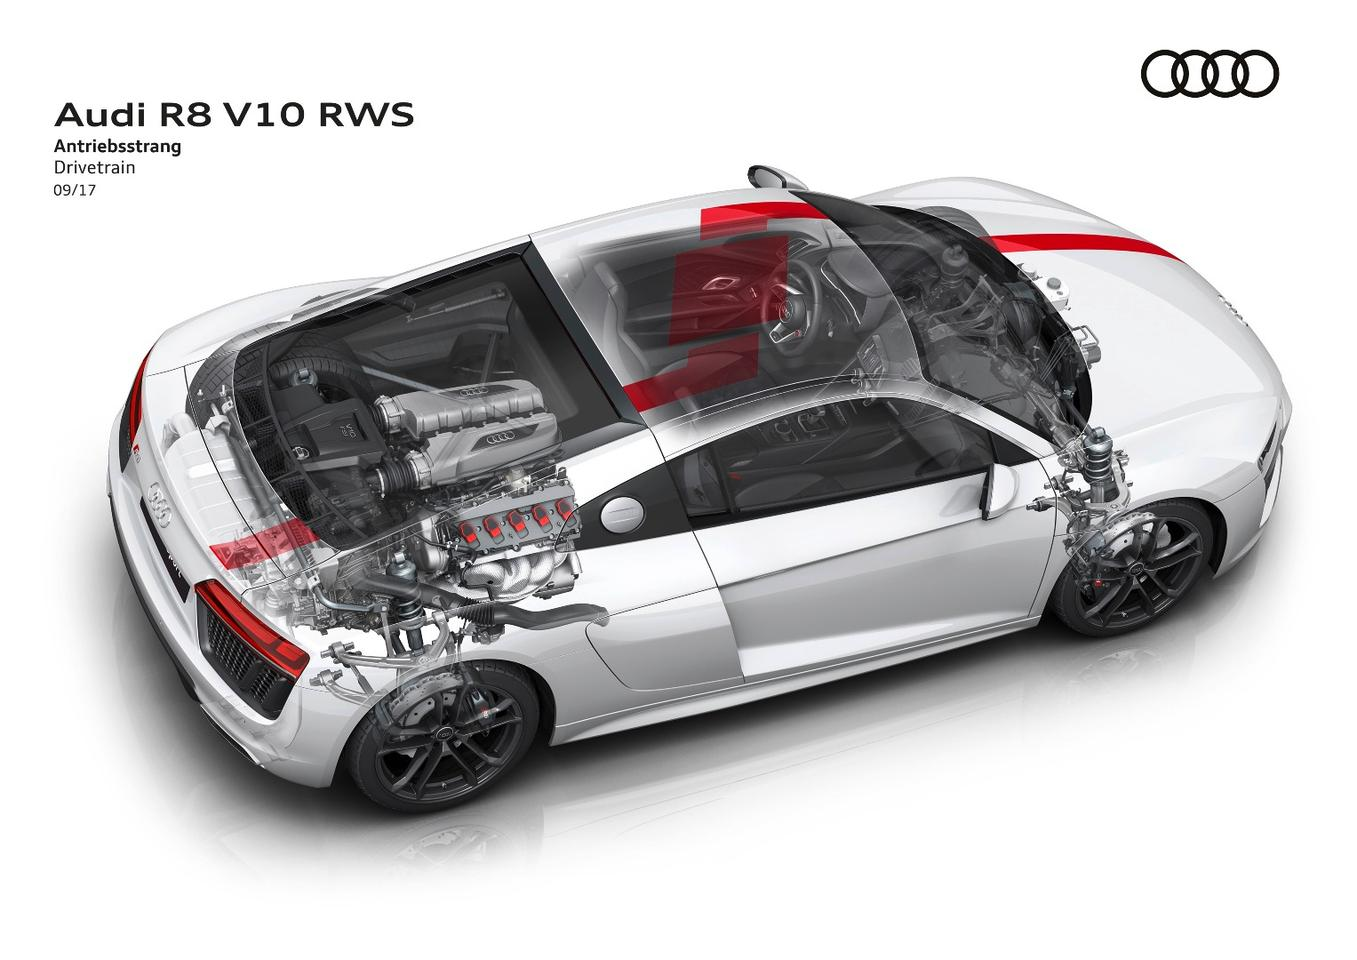 Under the skin of the Audi R8 V10 RWS